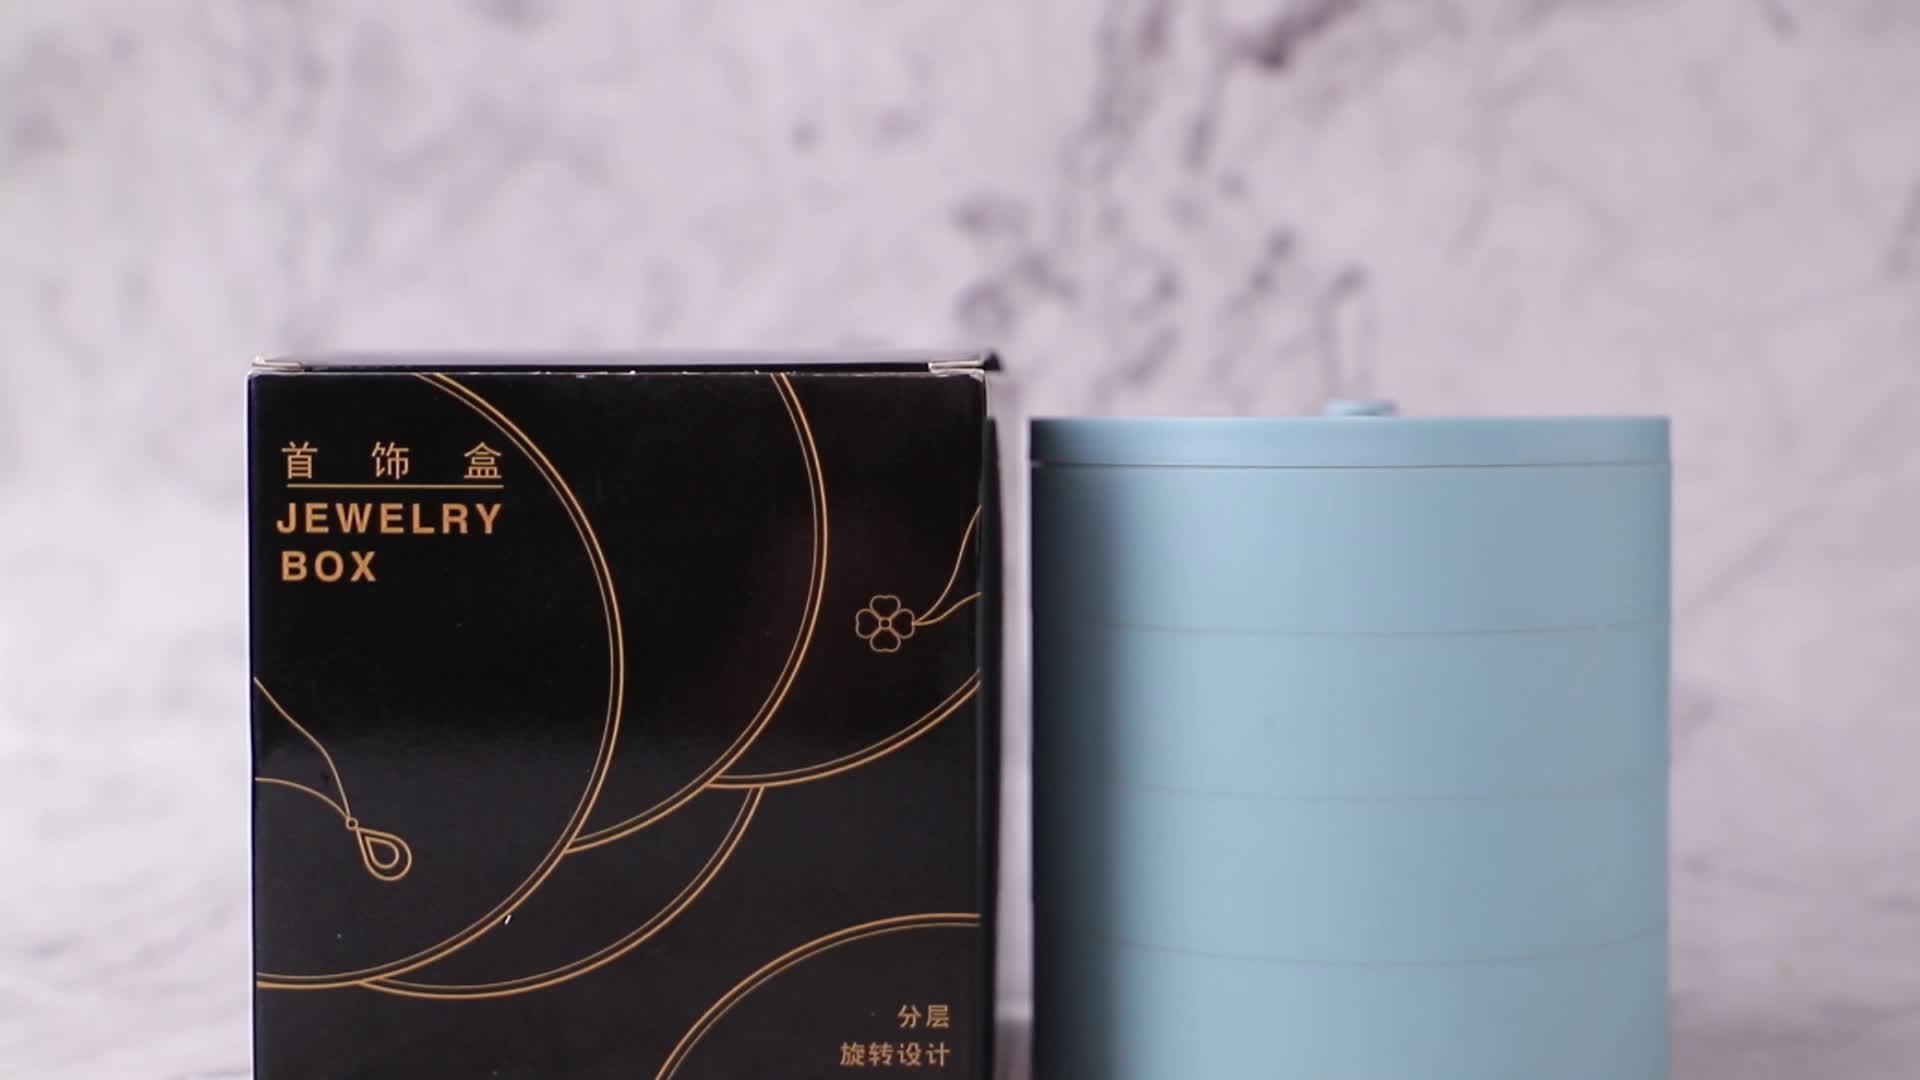 360 Degree Rotating Jewelry Storage Box 4 Layers luxury Jewelry packaging box 2020